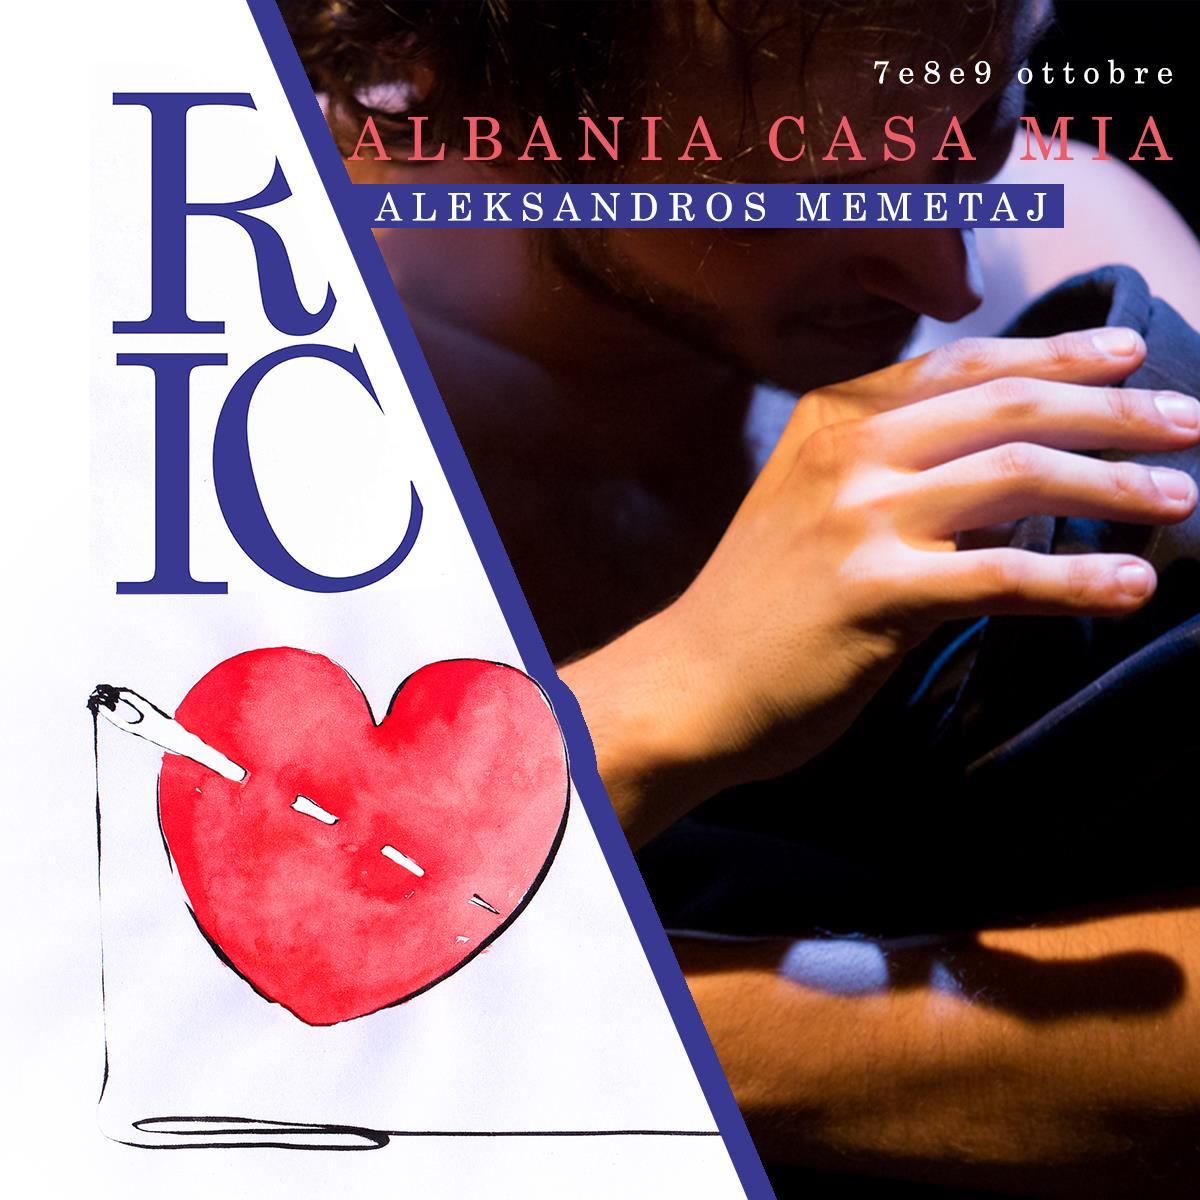 Albania_RICFestival